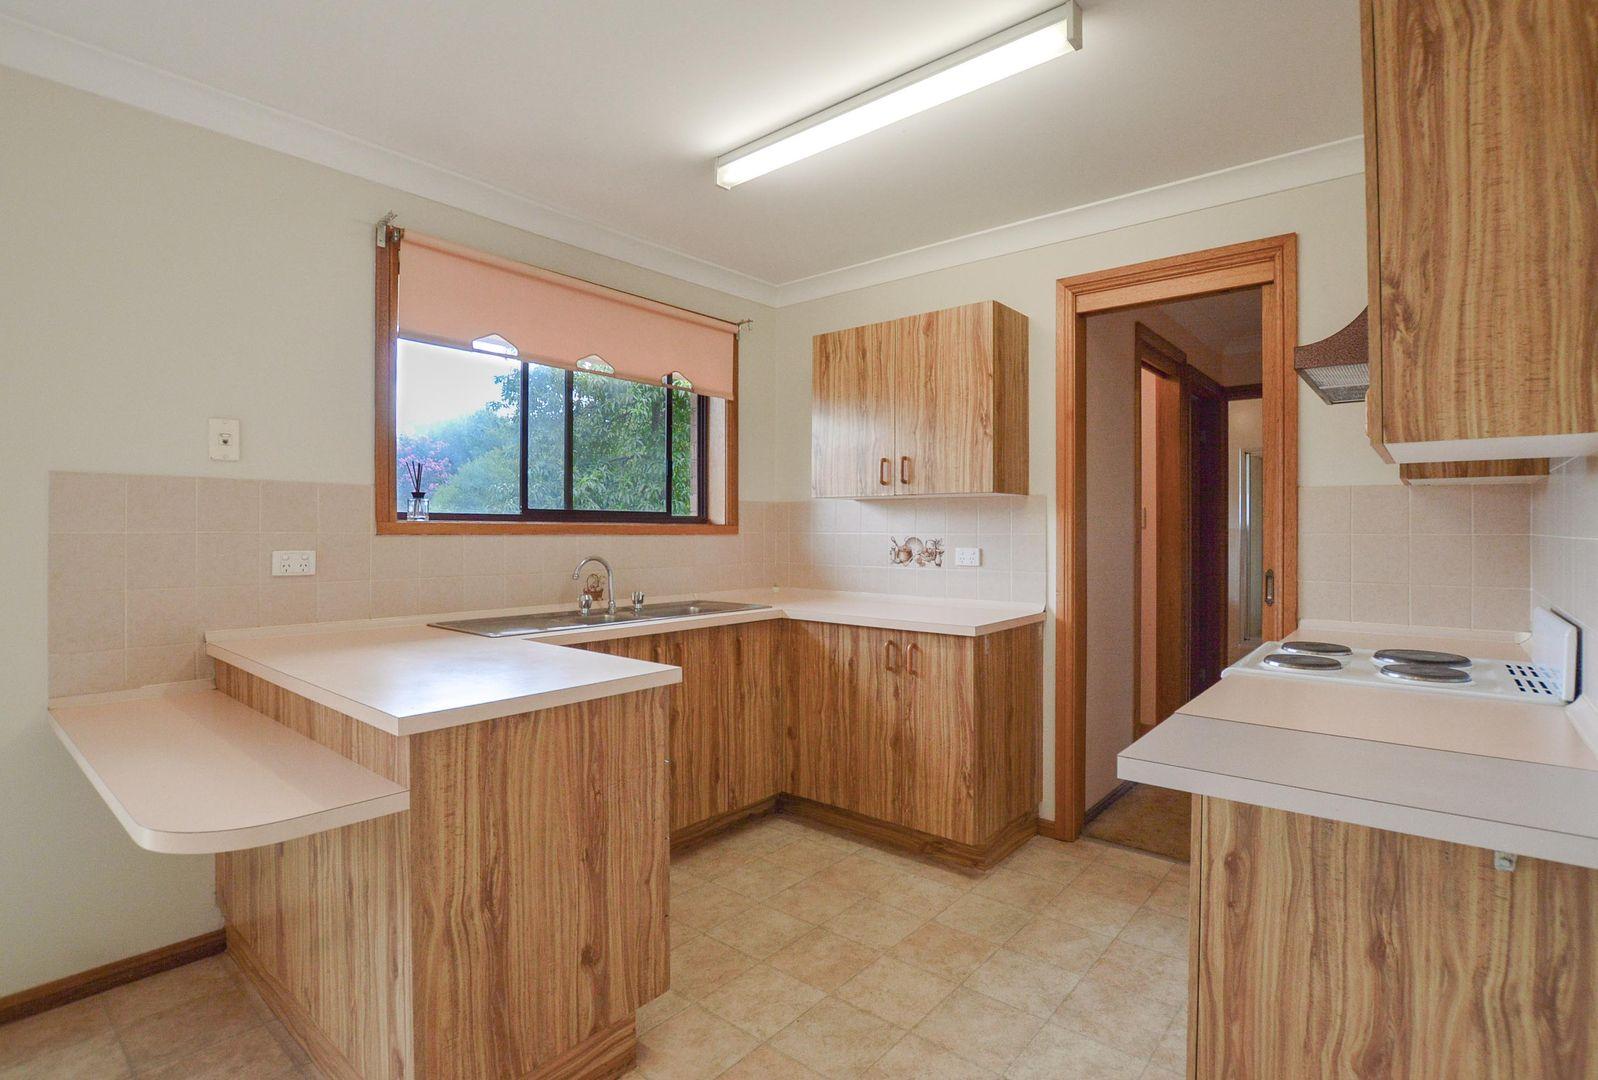 2/5 Barigan Street, Mudgee NSW 2850, Image 2